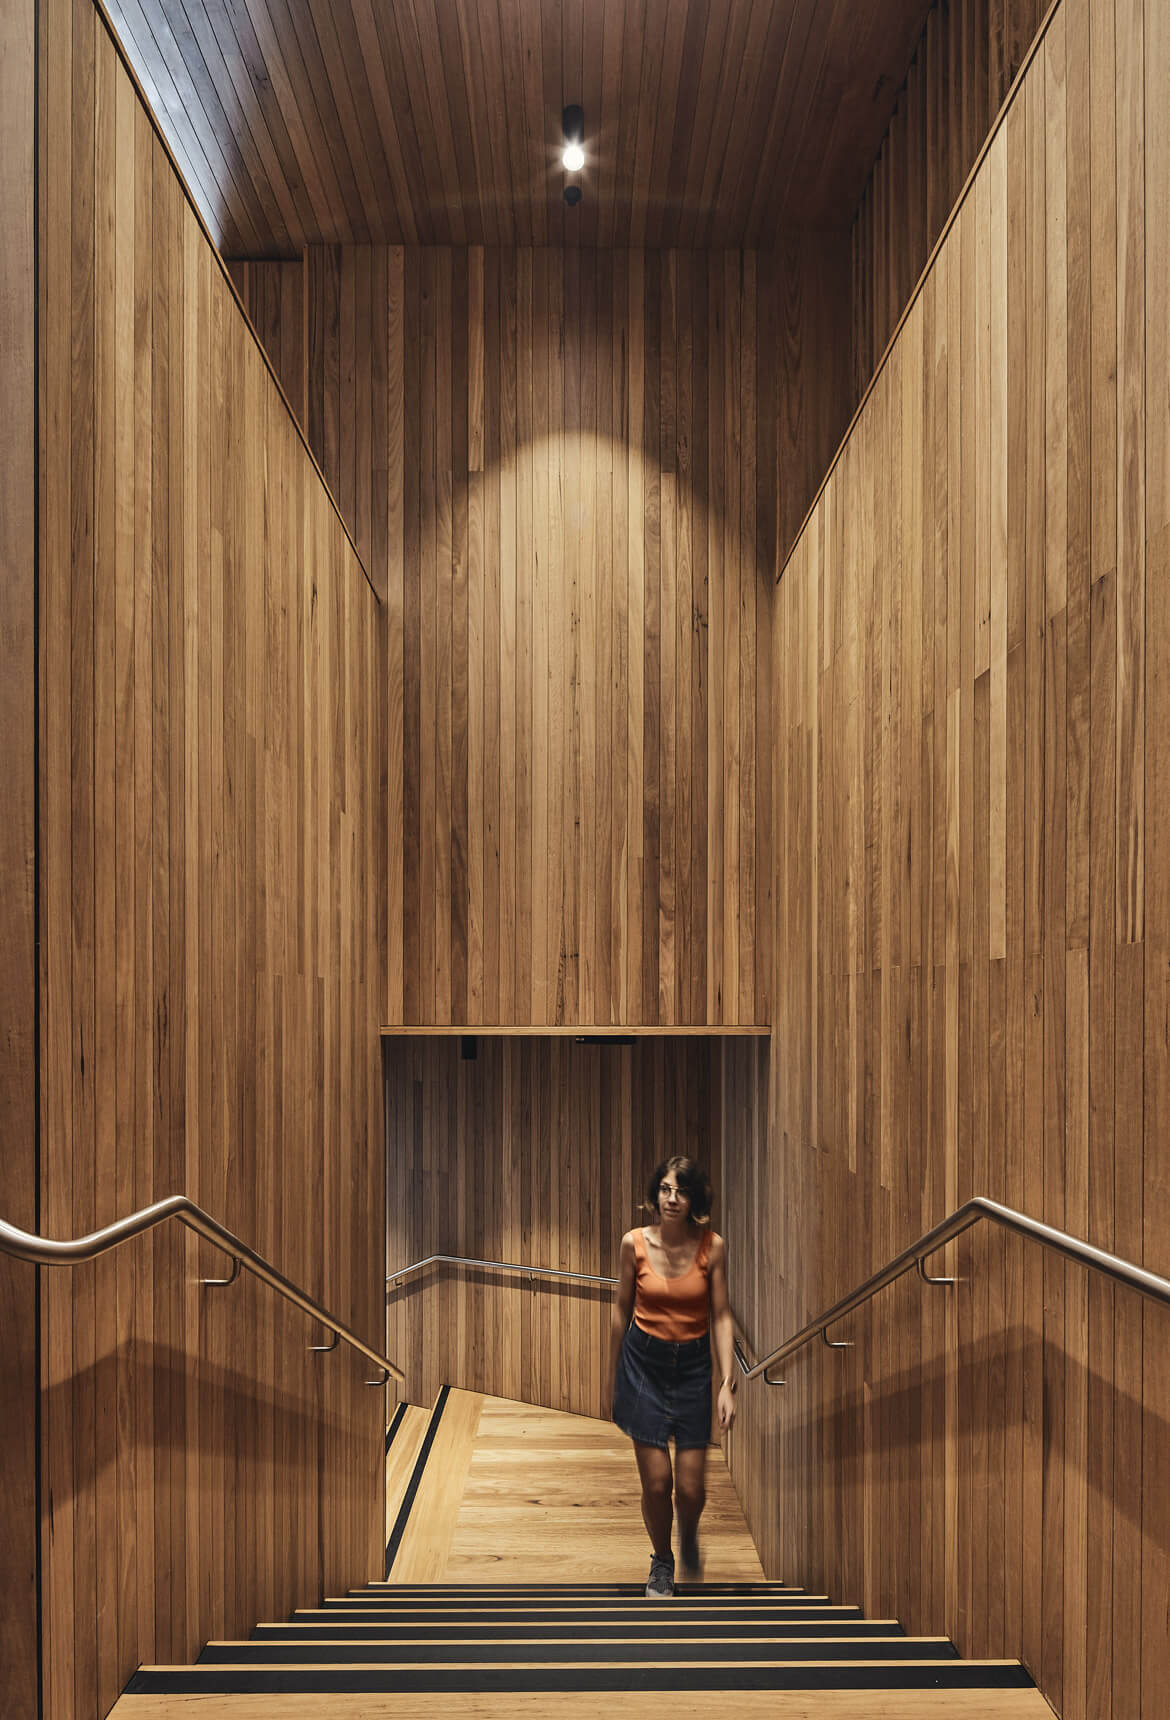 Gunyama Park timber ceilings and walls